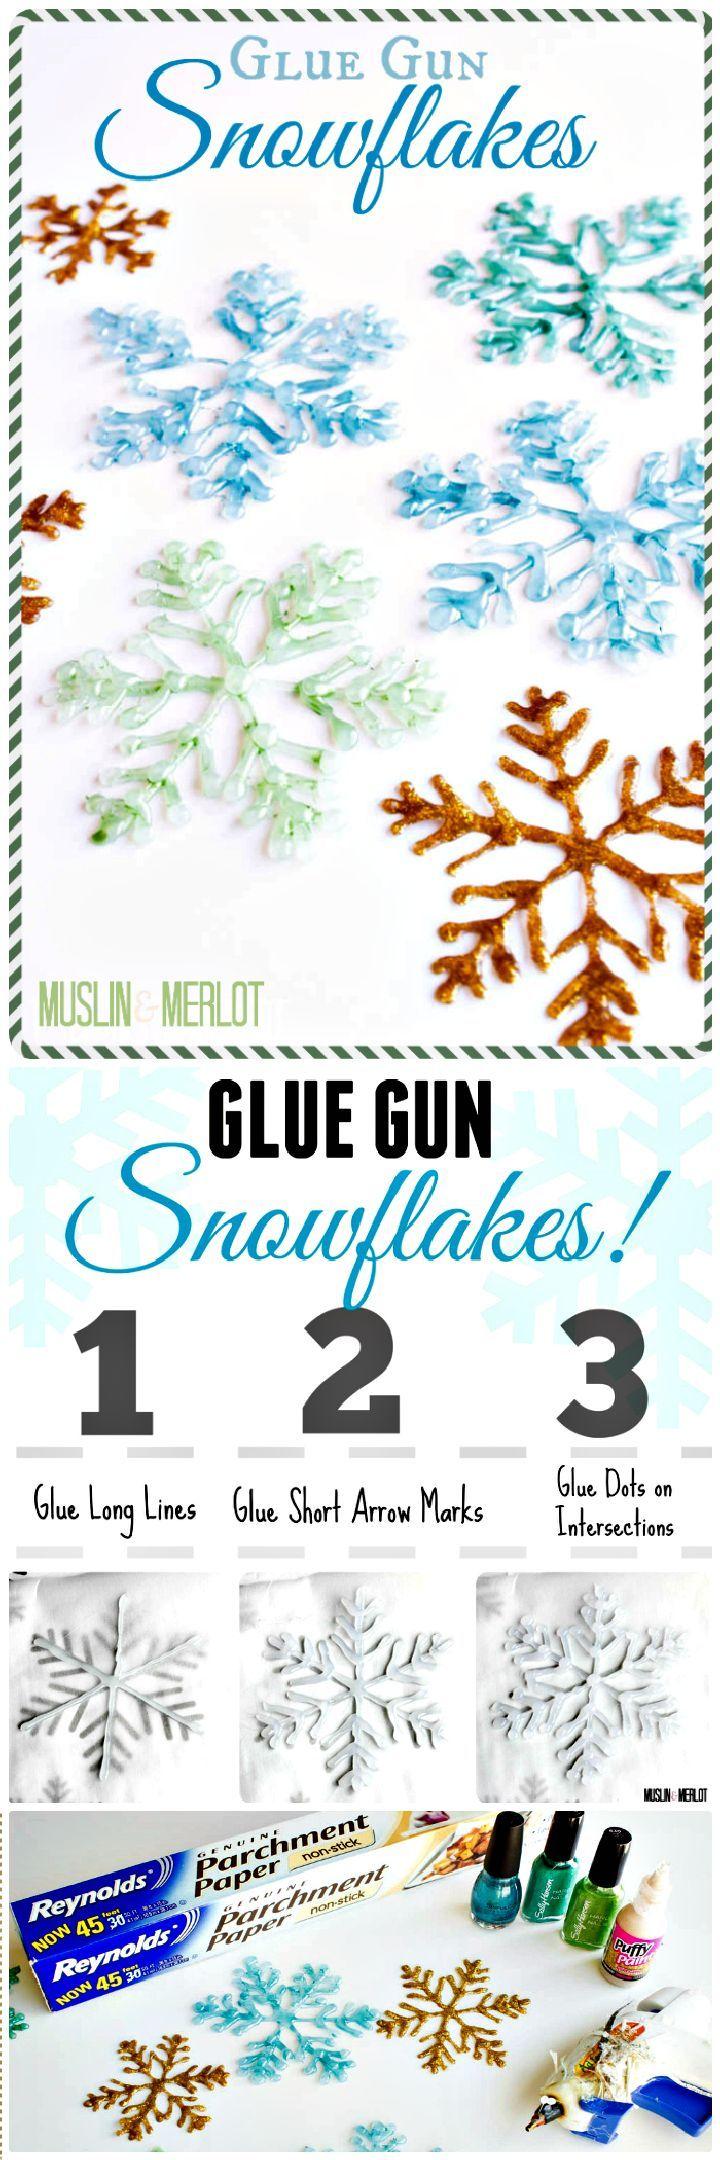 DIY Make Glue Gun Snowflakes - 25 Genius DIY Glue Gun Crafts To Make Creative Things - I Heart Crafty